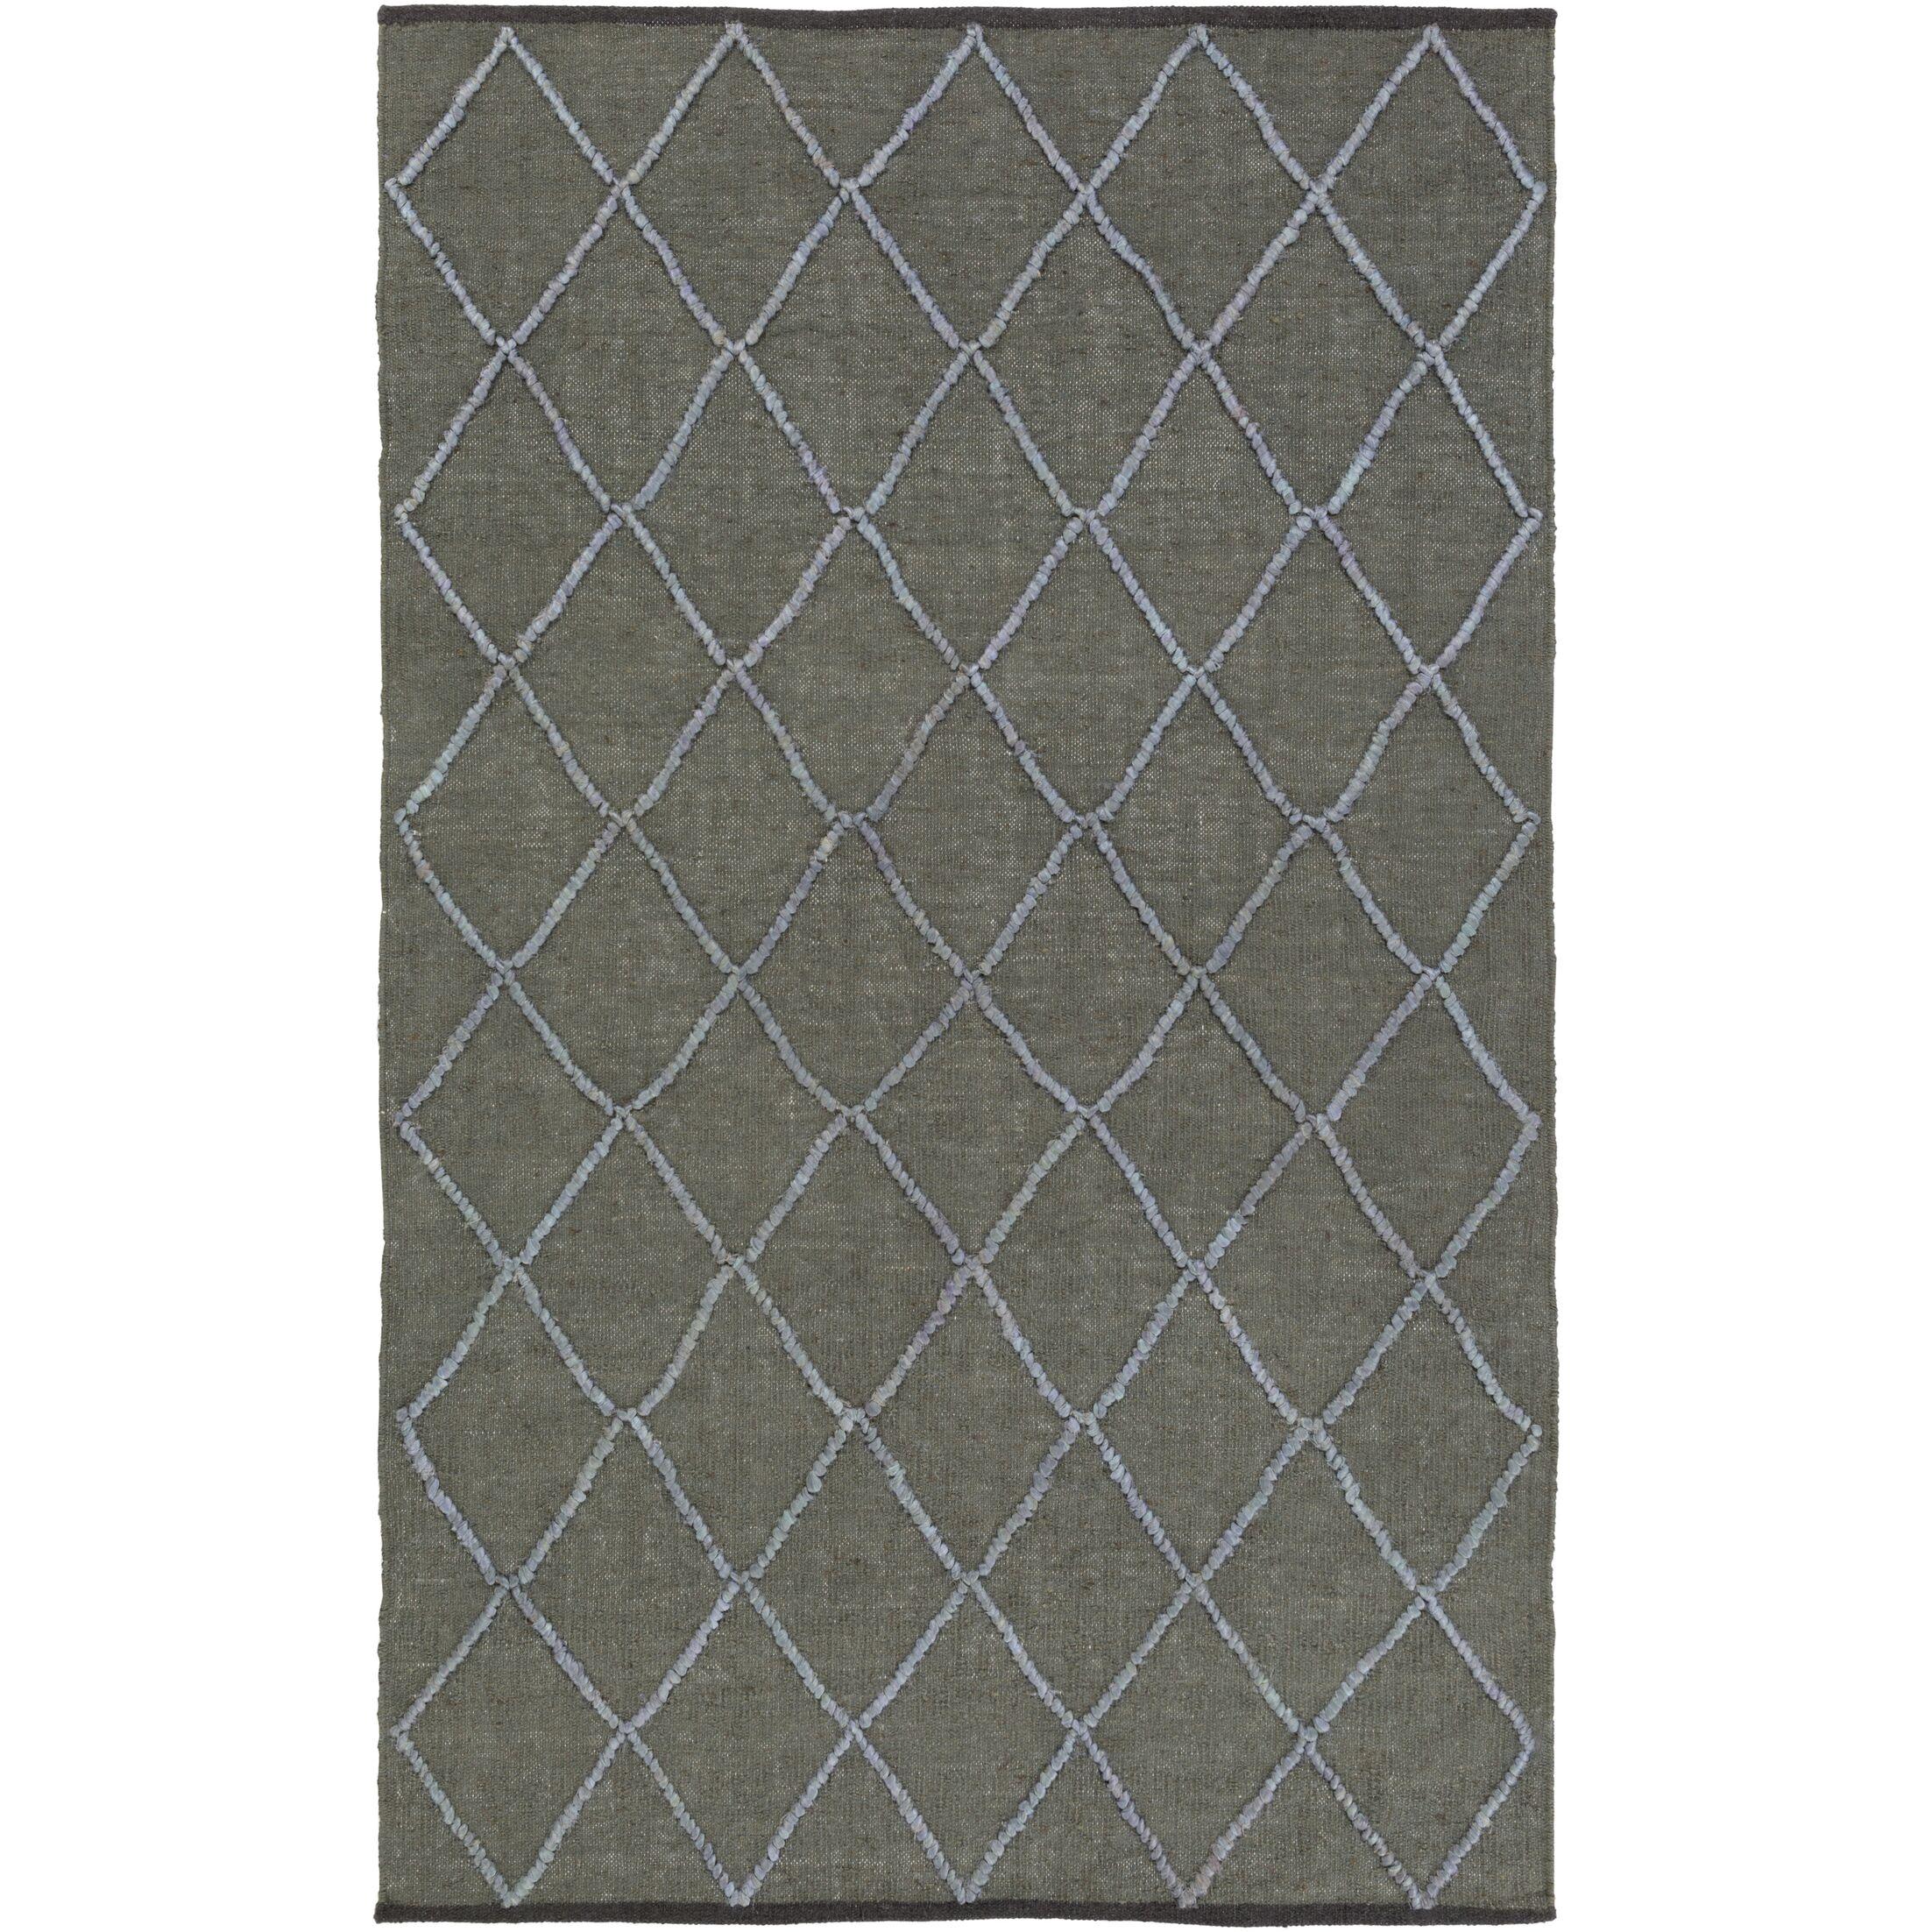 Devan Hand-Woven Olive/Slate Area Rug Rug Size: Rectangle 4' x 6'